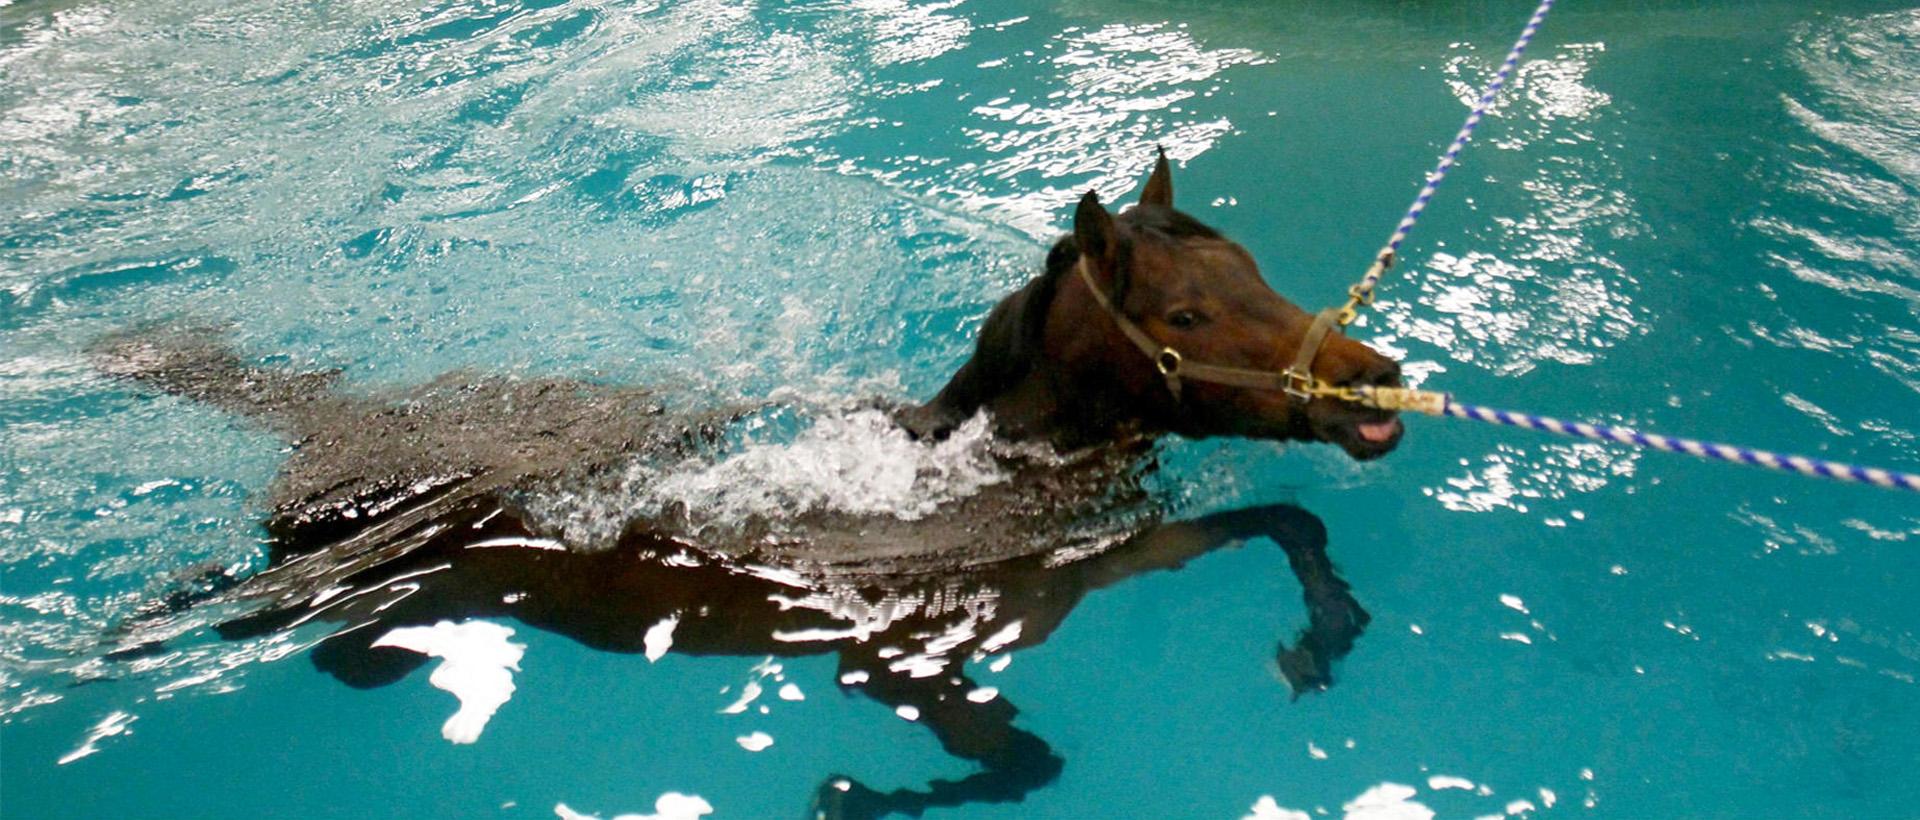 animal-pool-desert-leisure